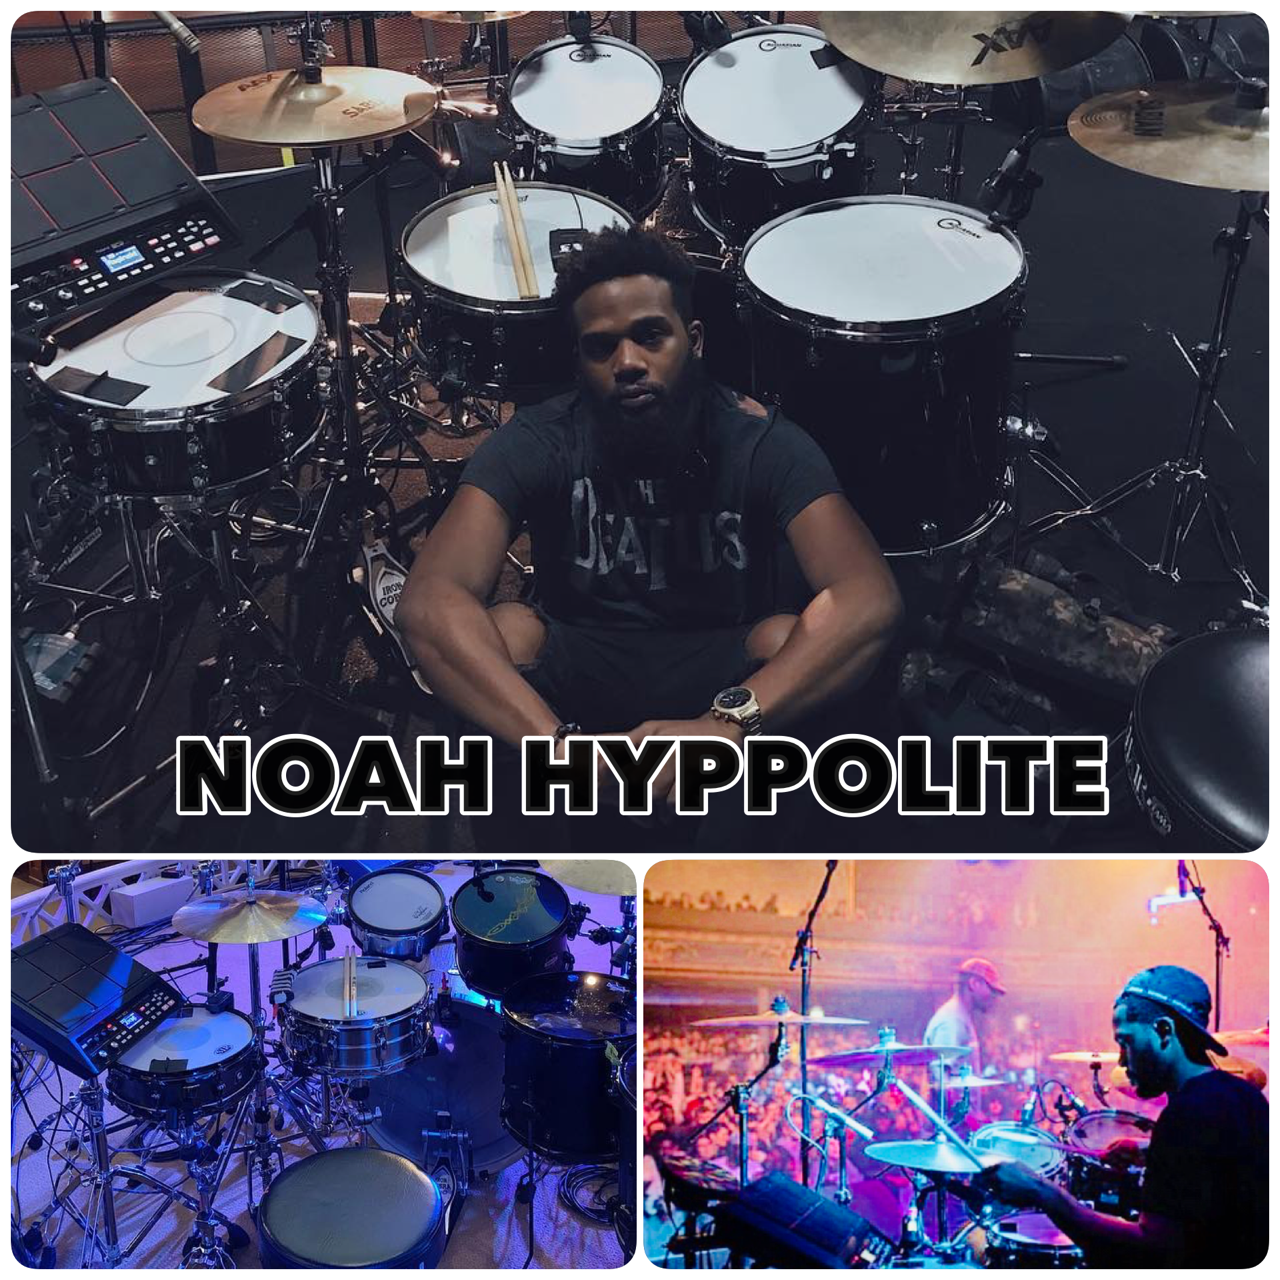 Noah Hyppolite